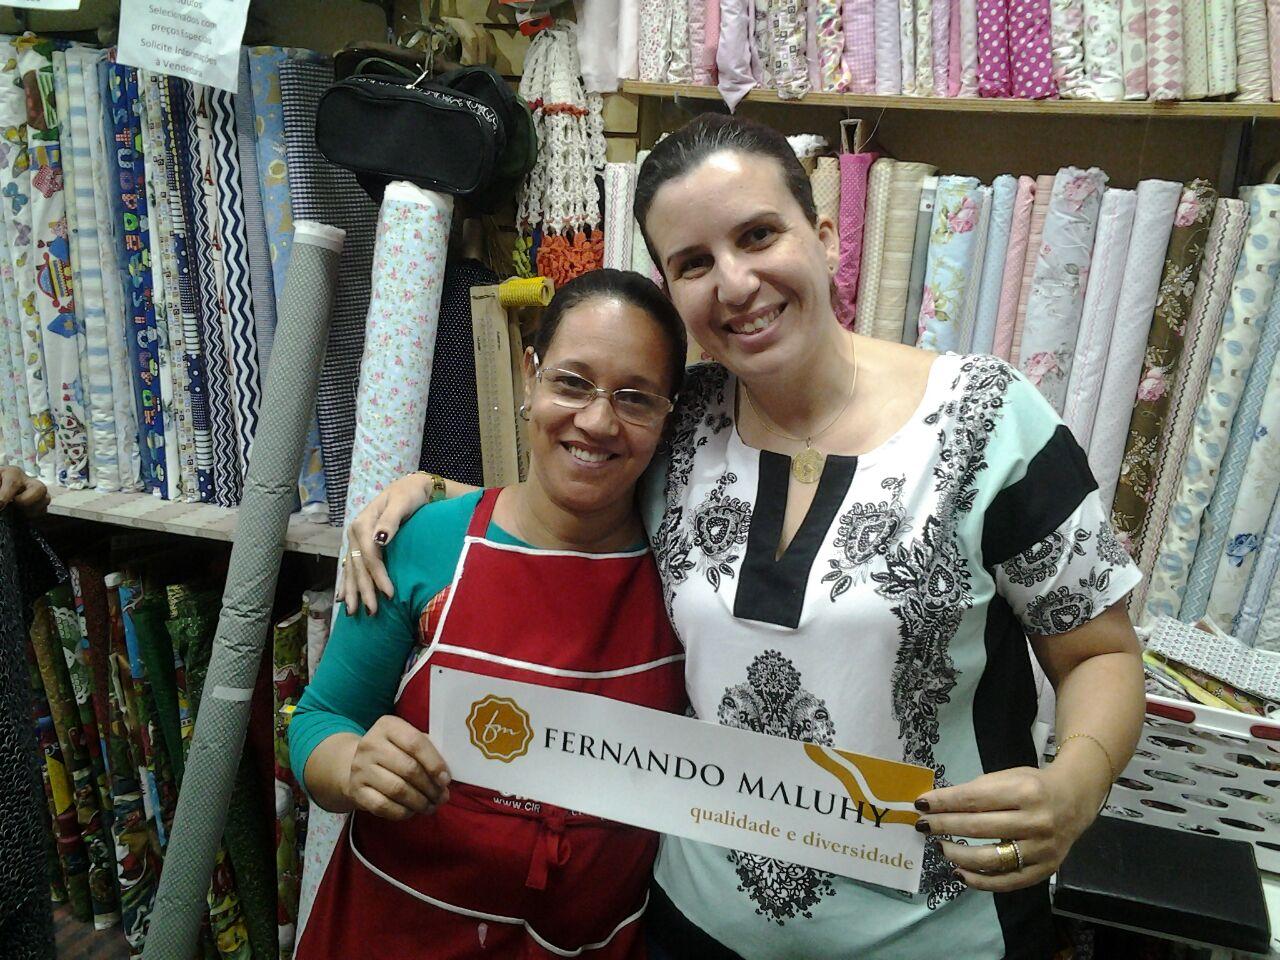 Belinha e Viviane com adesivo Maluhy - Loja Pirapetin de Barra Mansa